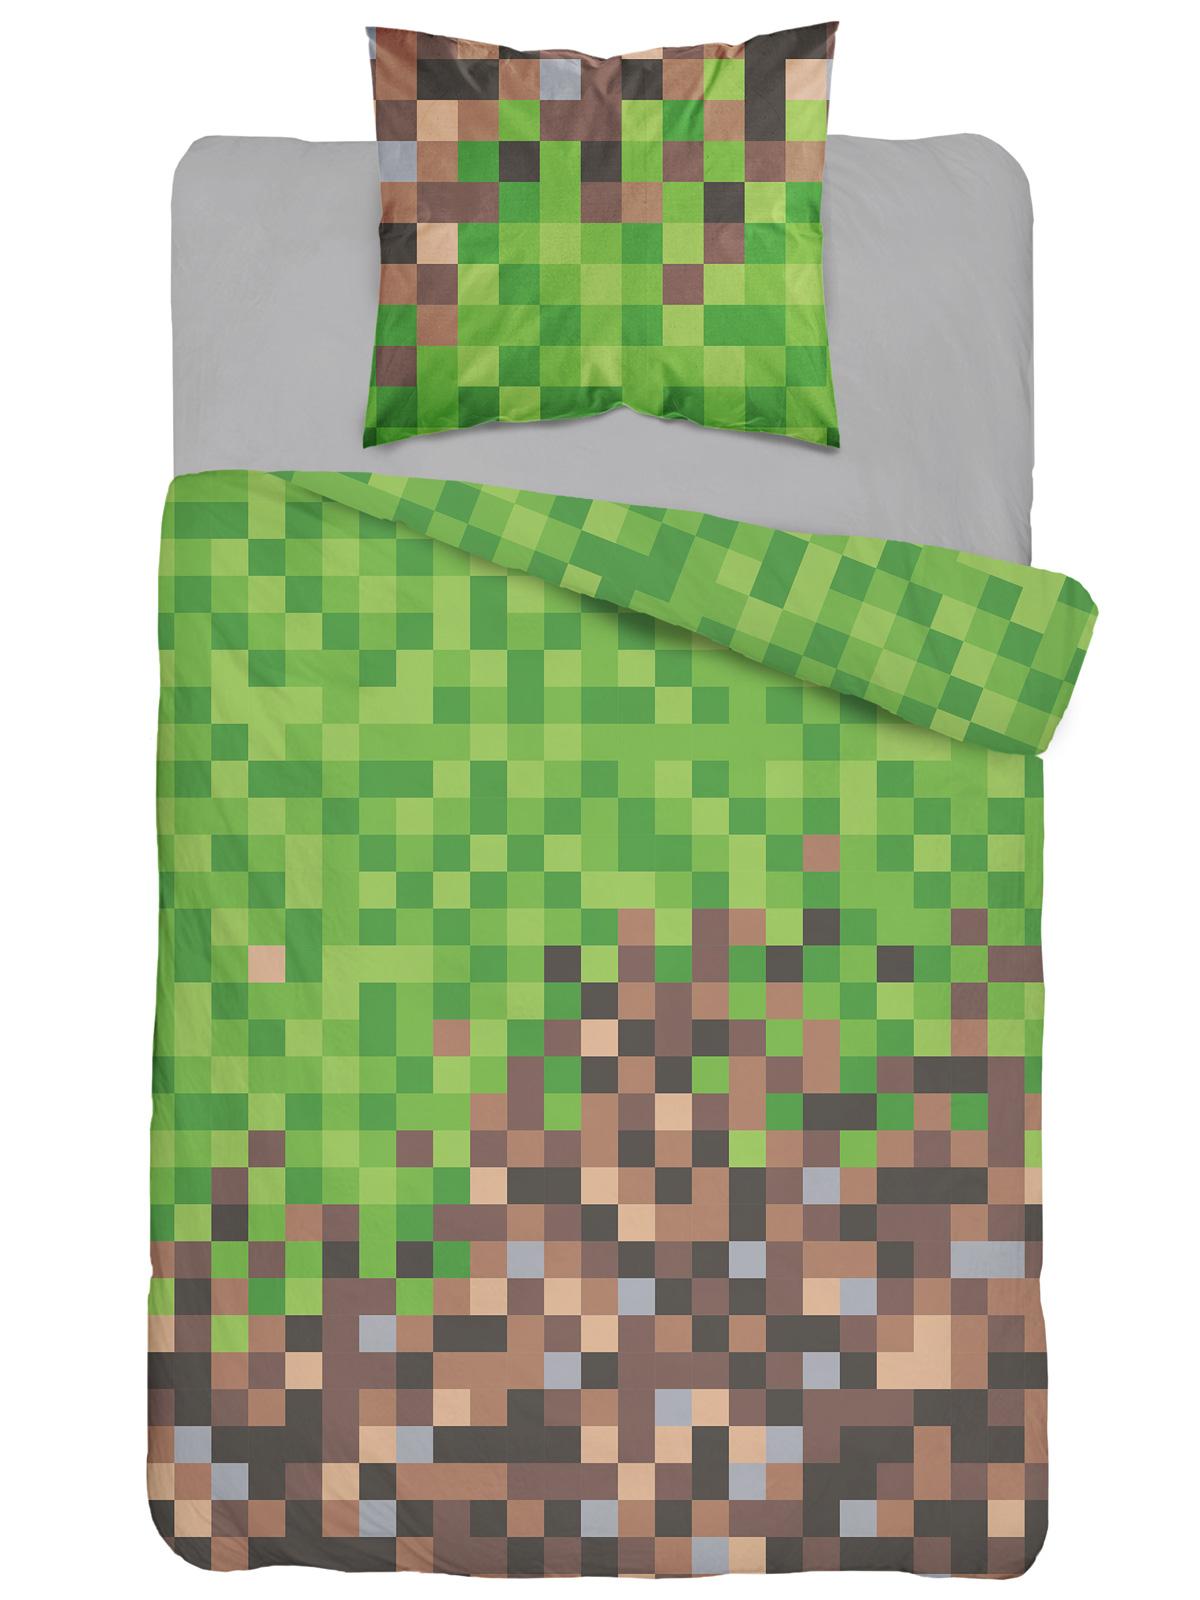 Mine Blocks Single Cotton Duvet Cover Set - European Size